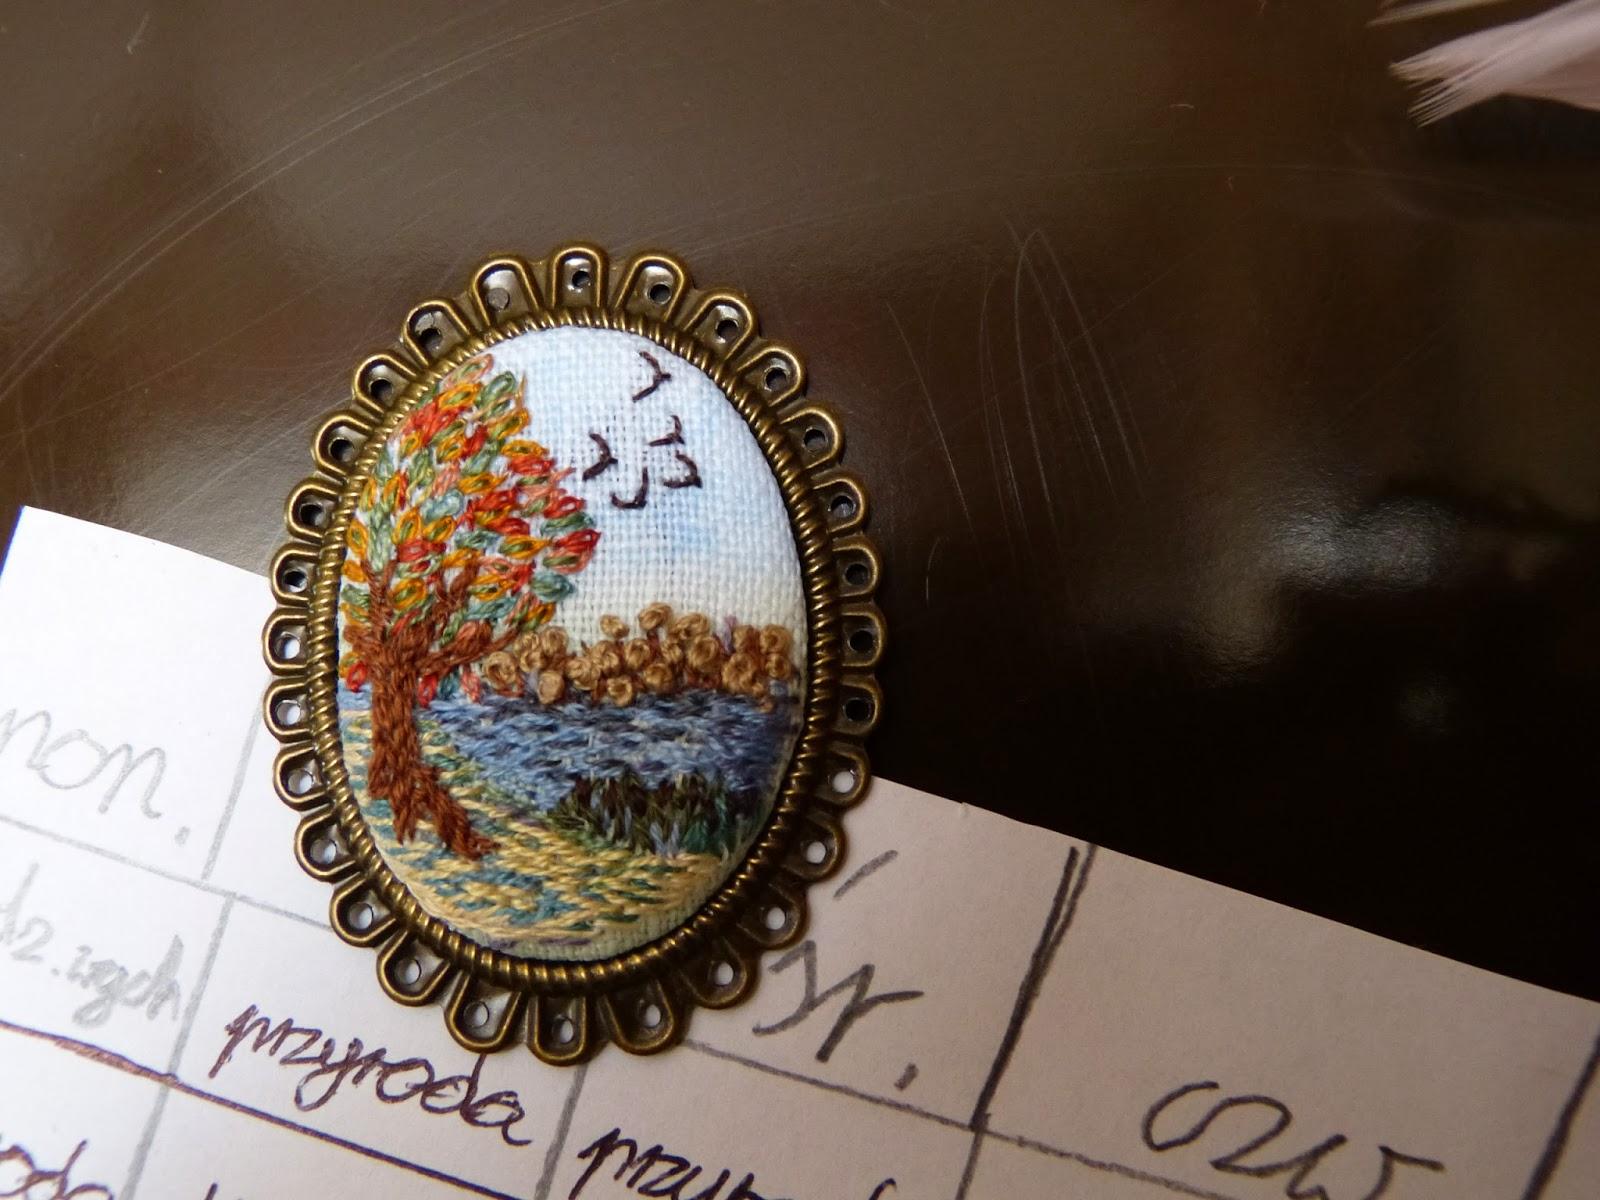 haftowany,  z haftem, haft płaski - malarski, embroidered , hand flat embroidery, magnes na lodówkę, medallion of embroidery,